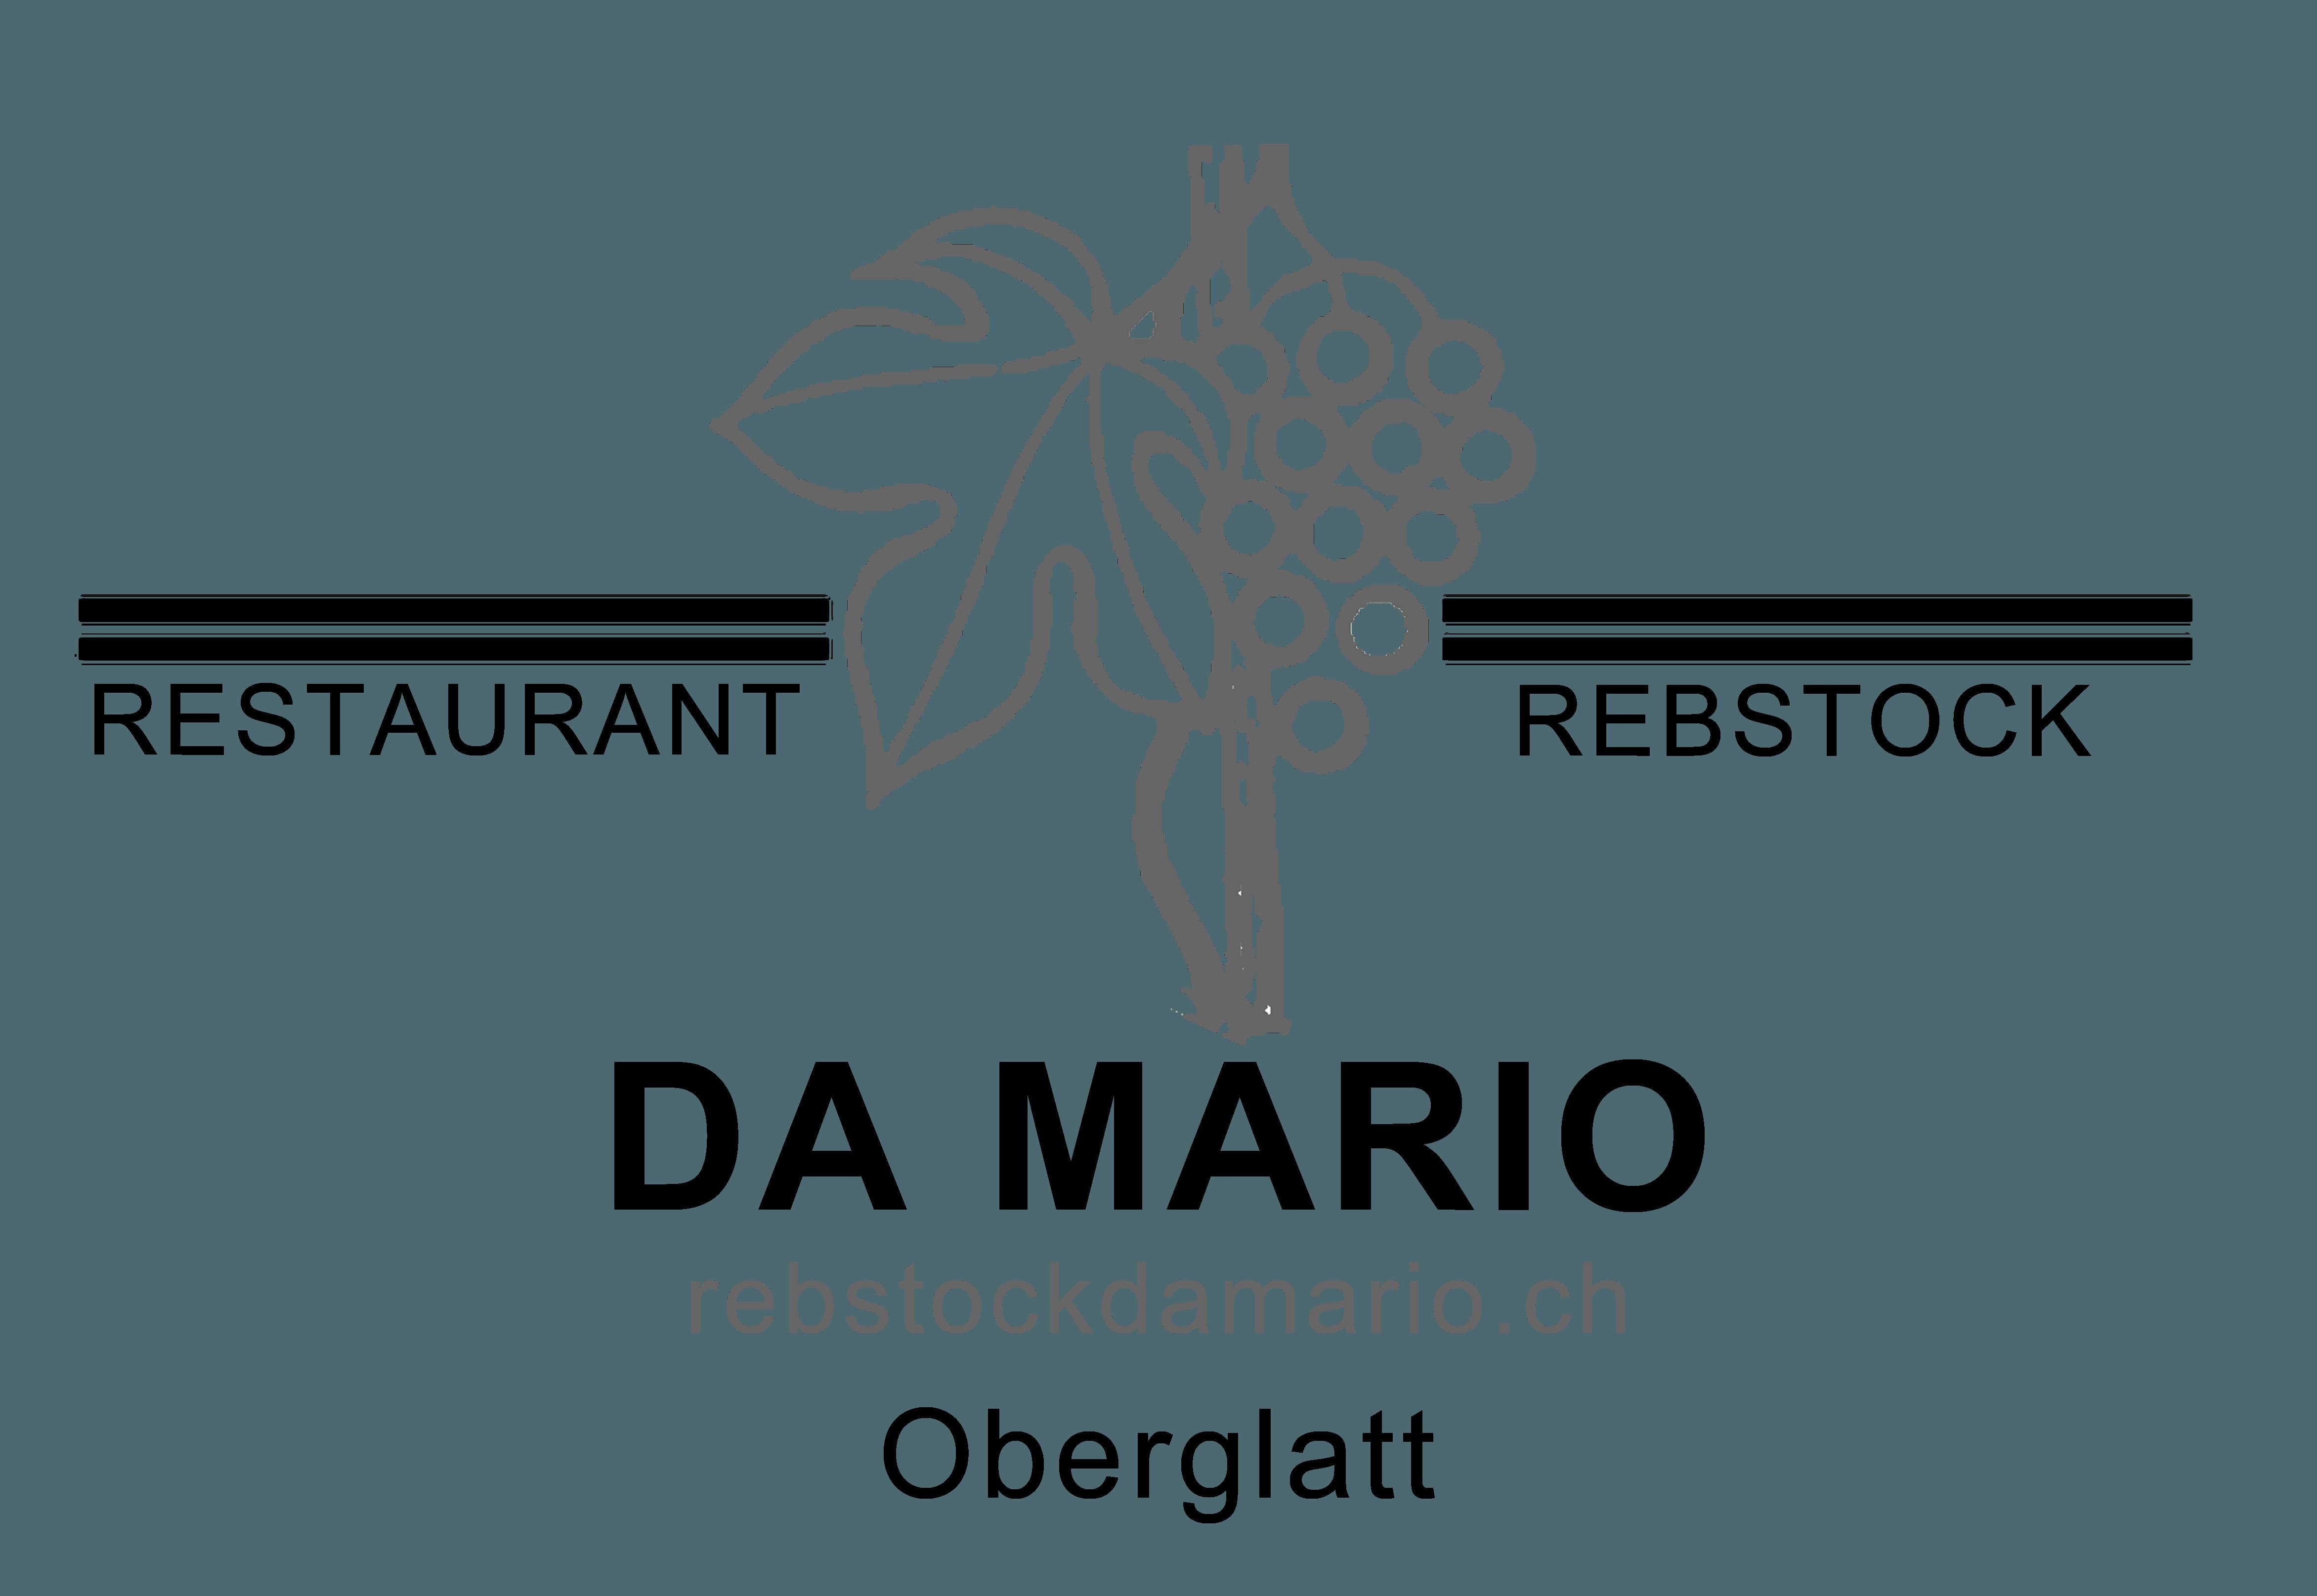 Restaurant Pizzeria Rebstock Da Mario